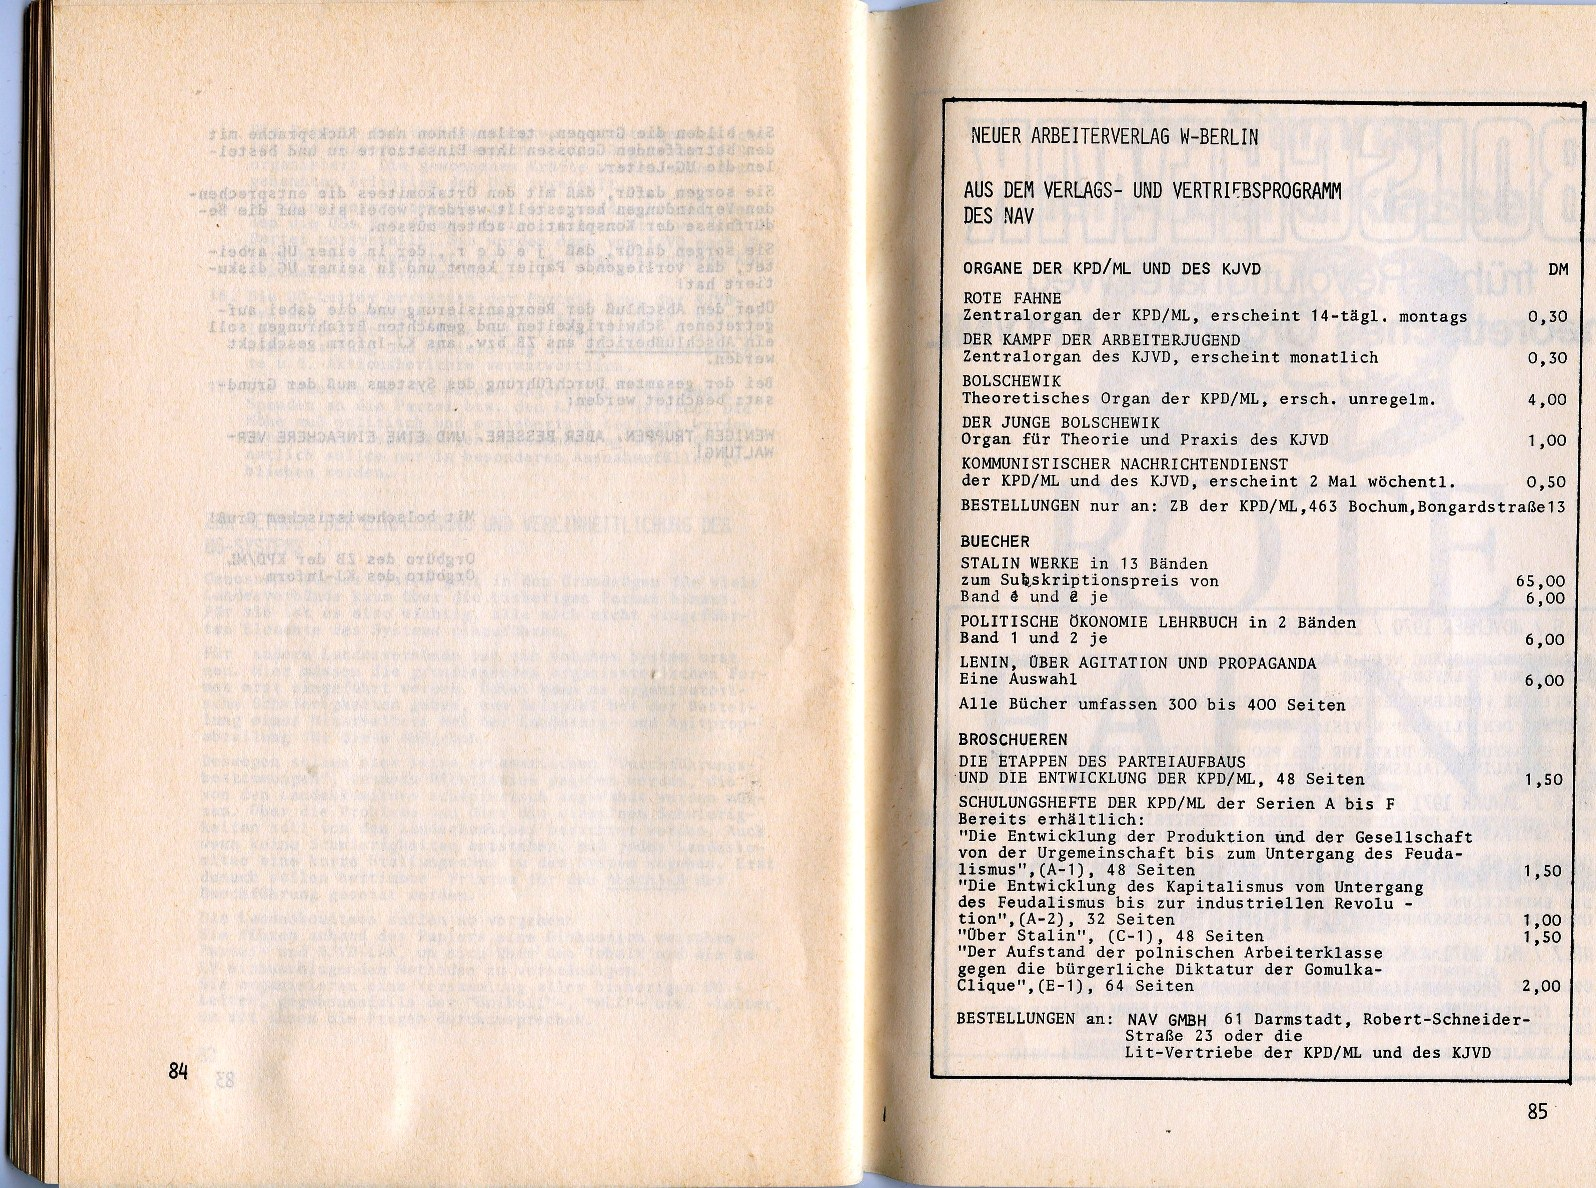 ZB_Parteiarbeiter_1971_07_44